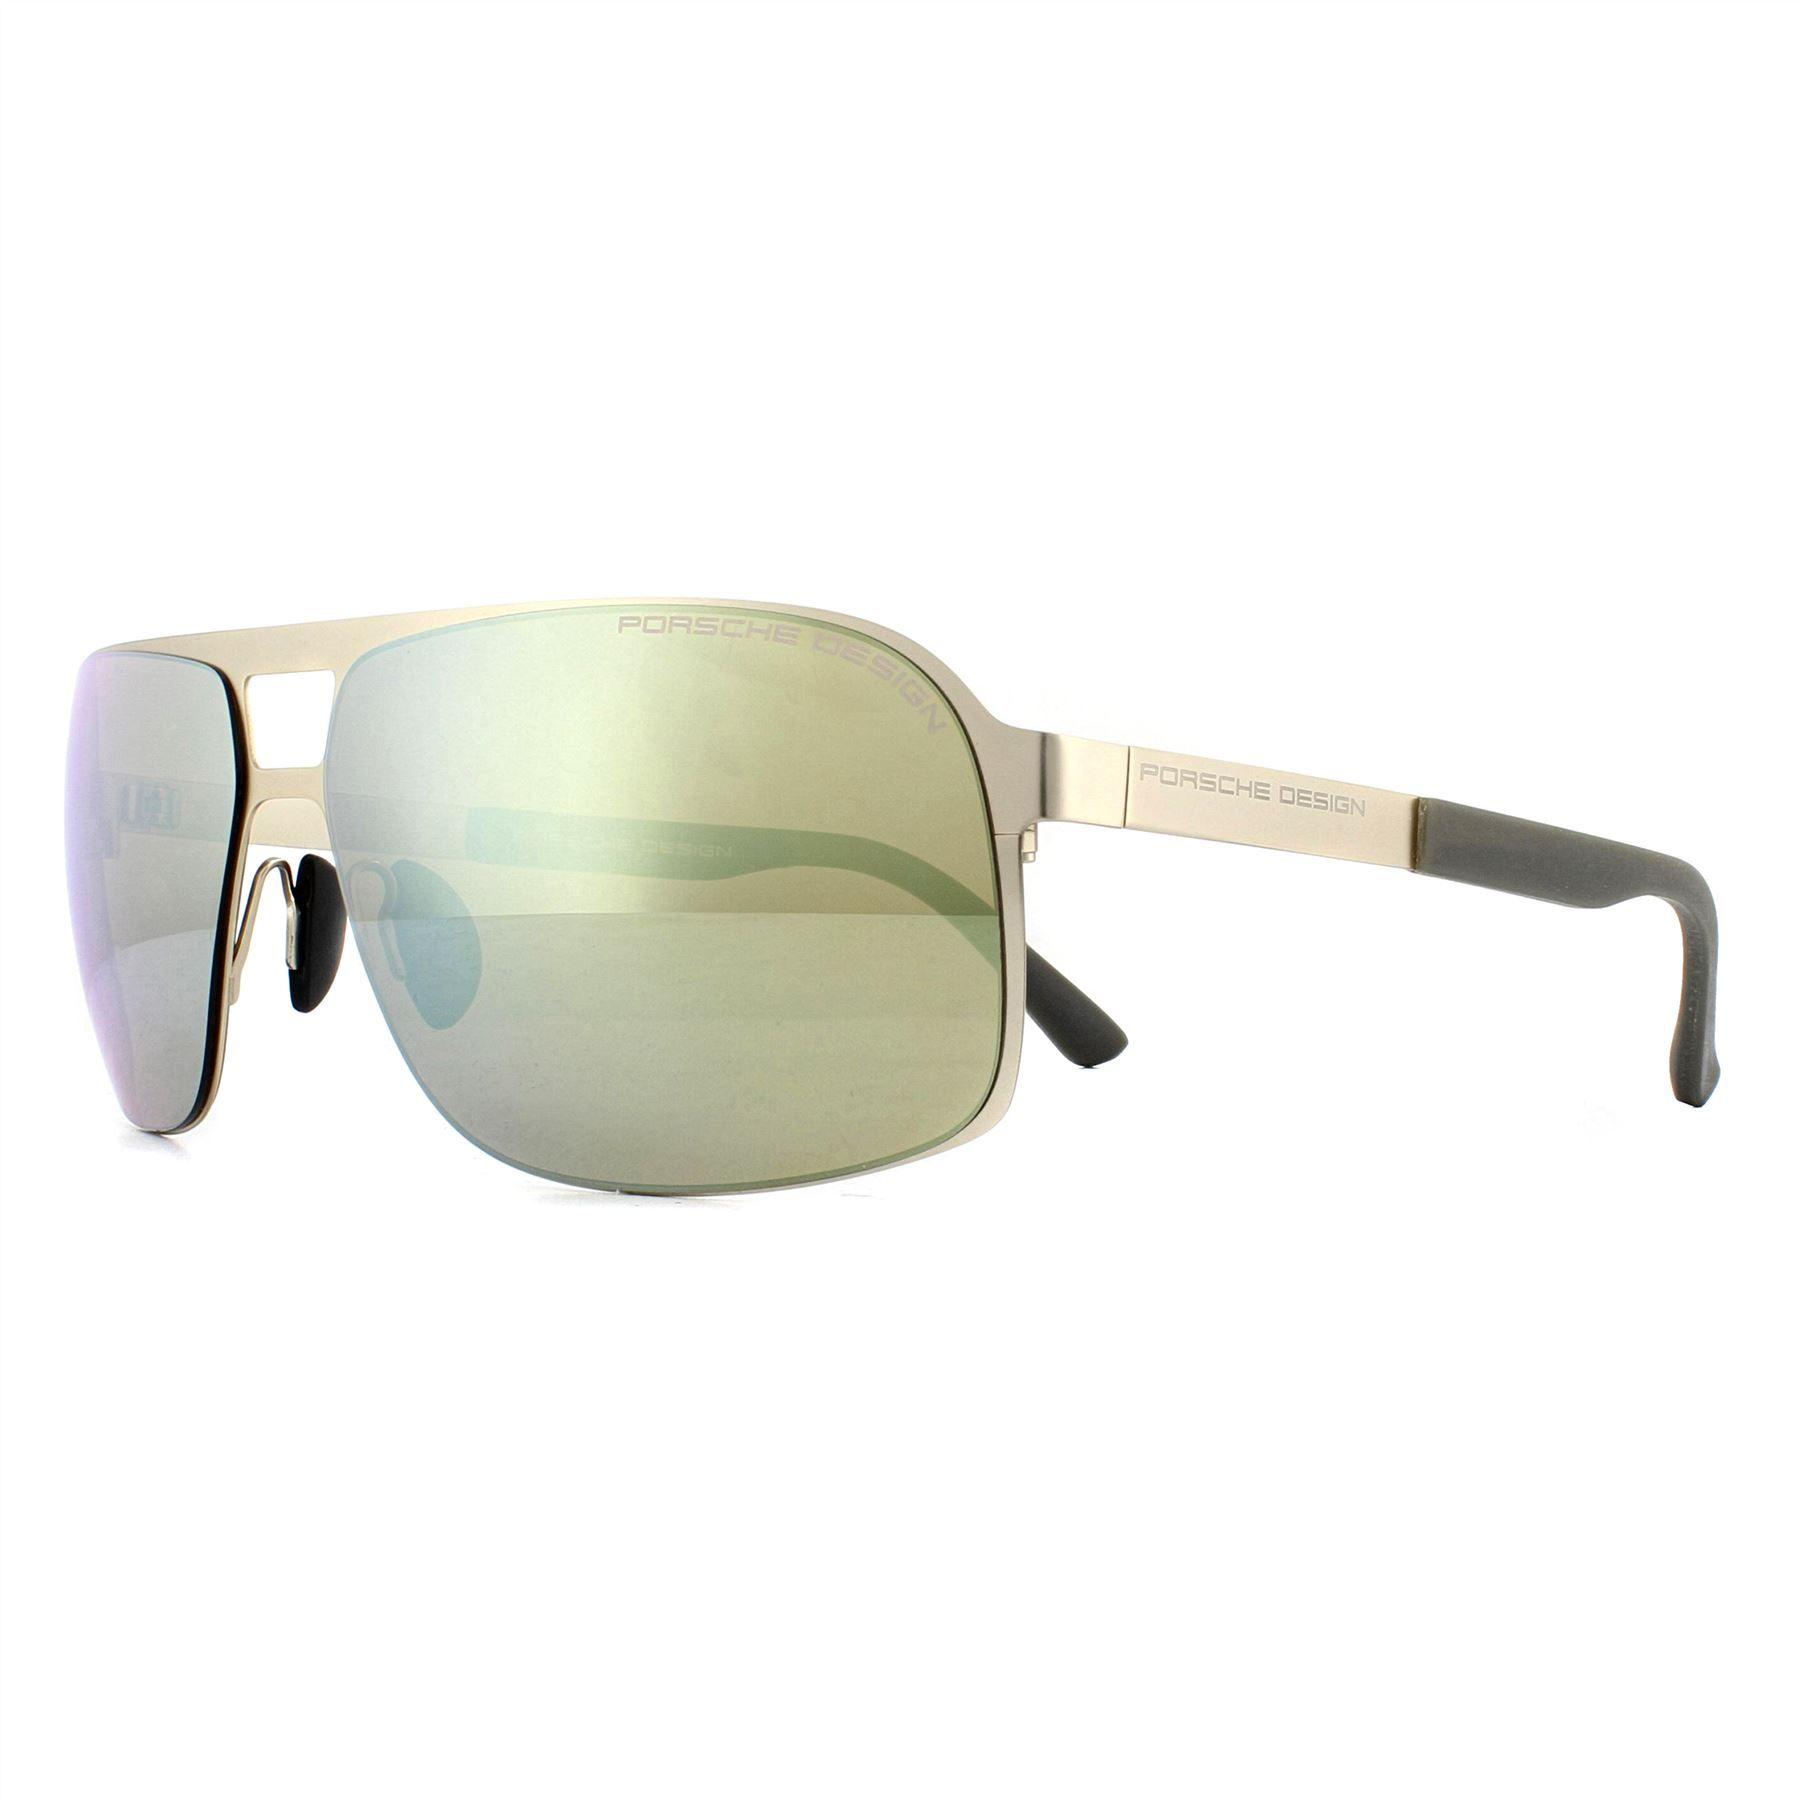 Porsche Design Sunglasses P8579 A Gold Yellow Silver Mirror